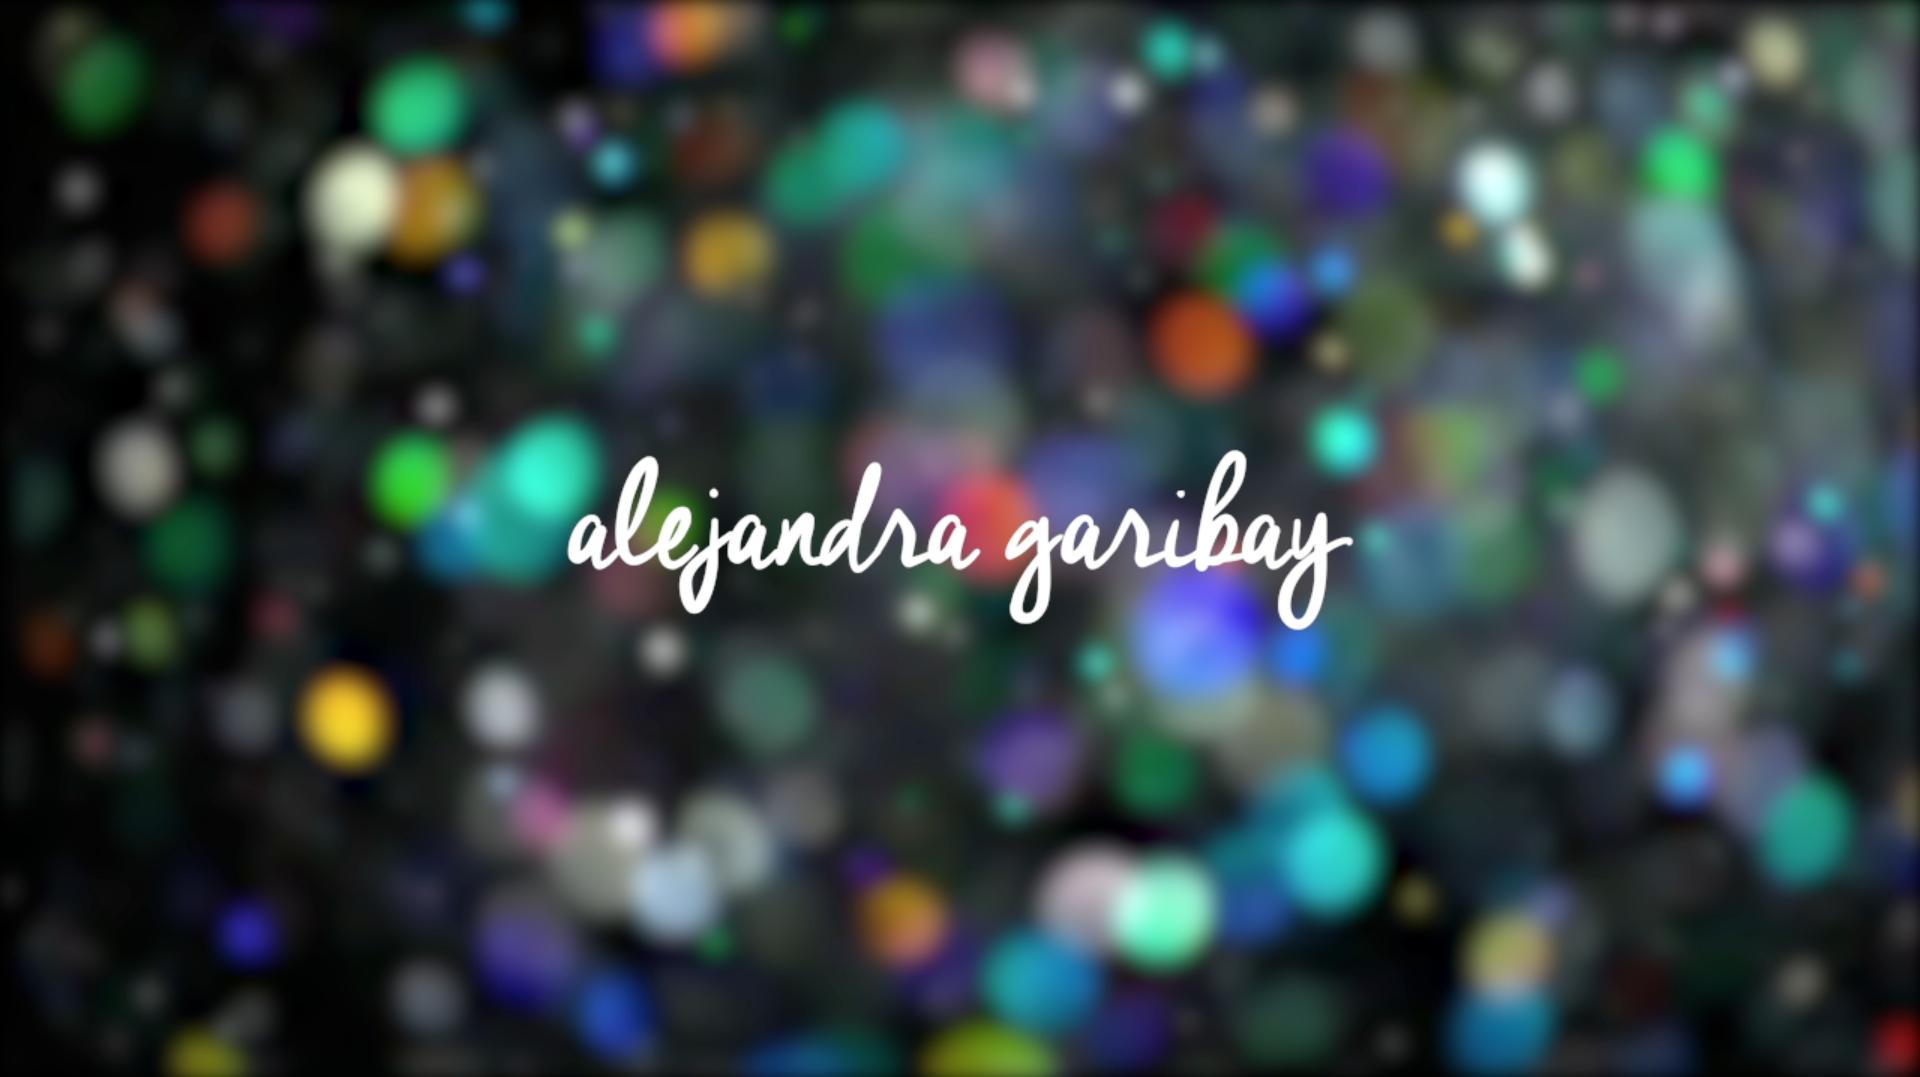 alejandra garibay